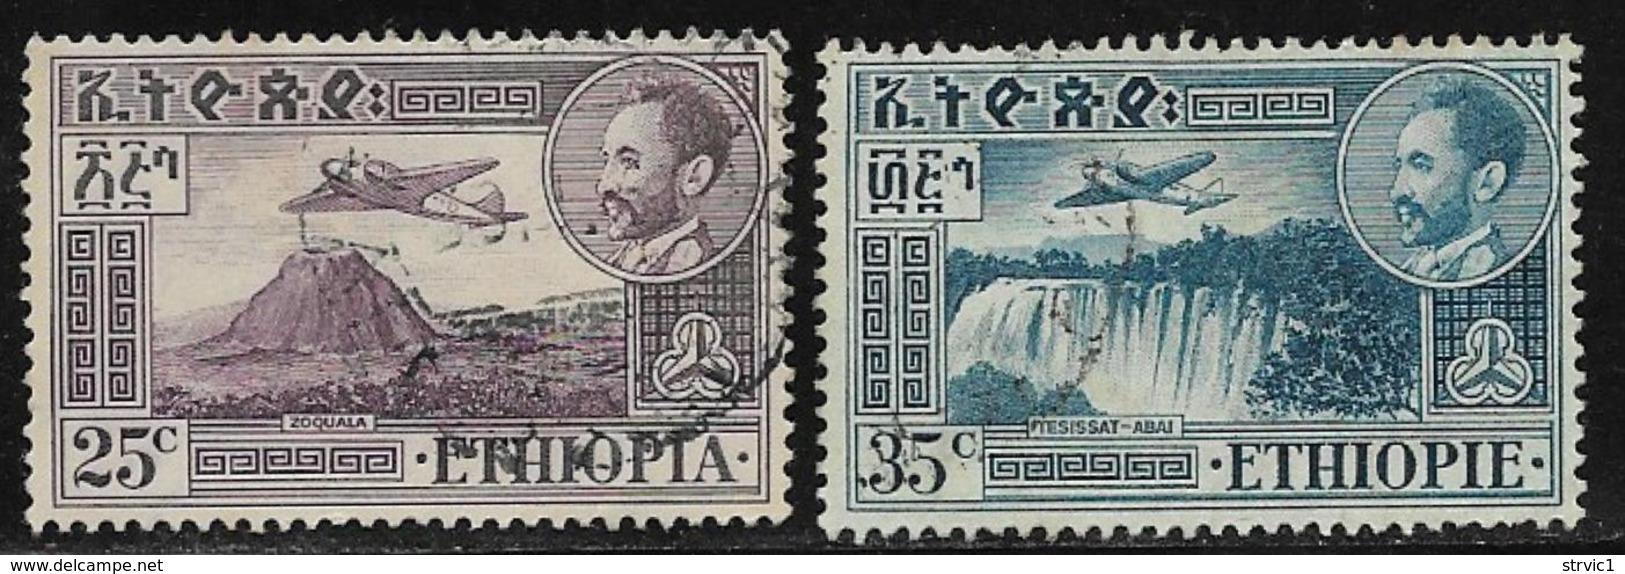 Ethiopia Scott # C25, C27 Used Volcano, Waterfall, 1952,1955 - Ethiopia